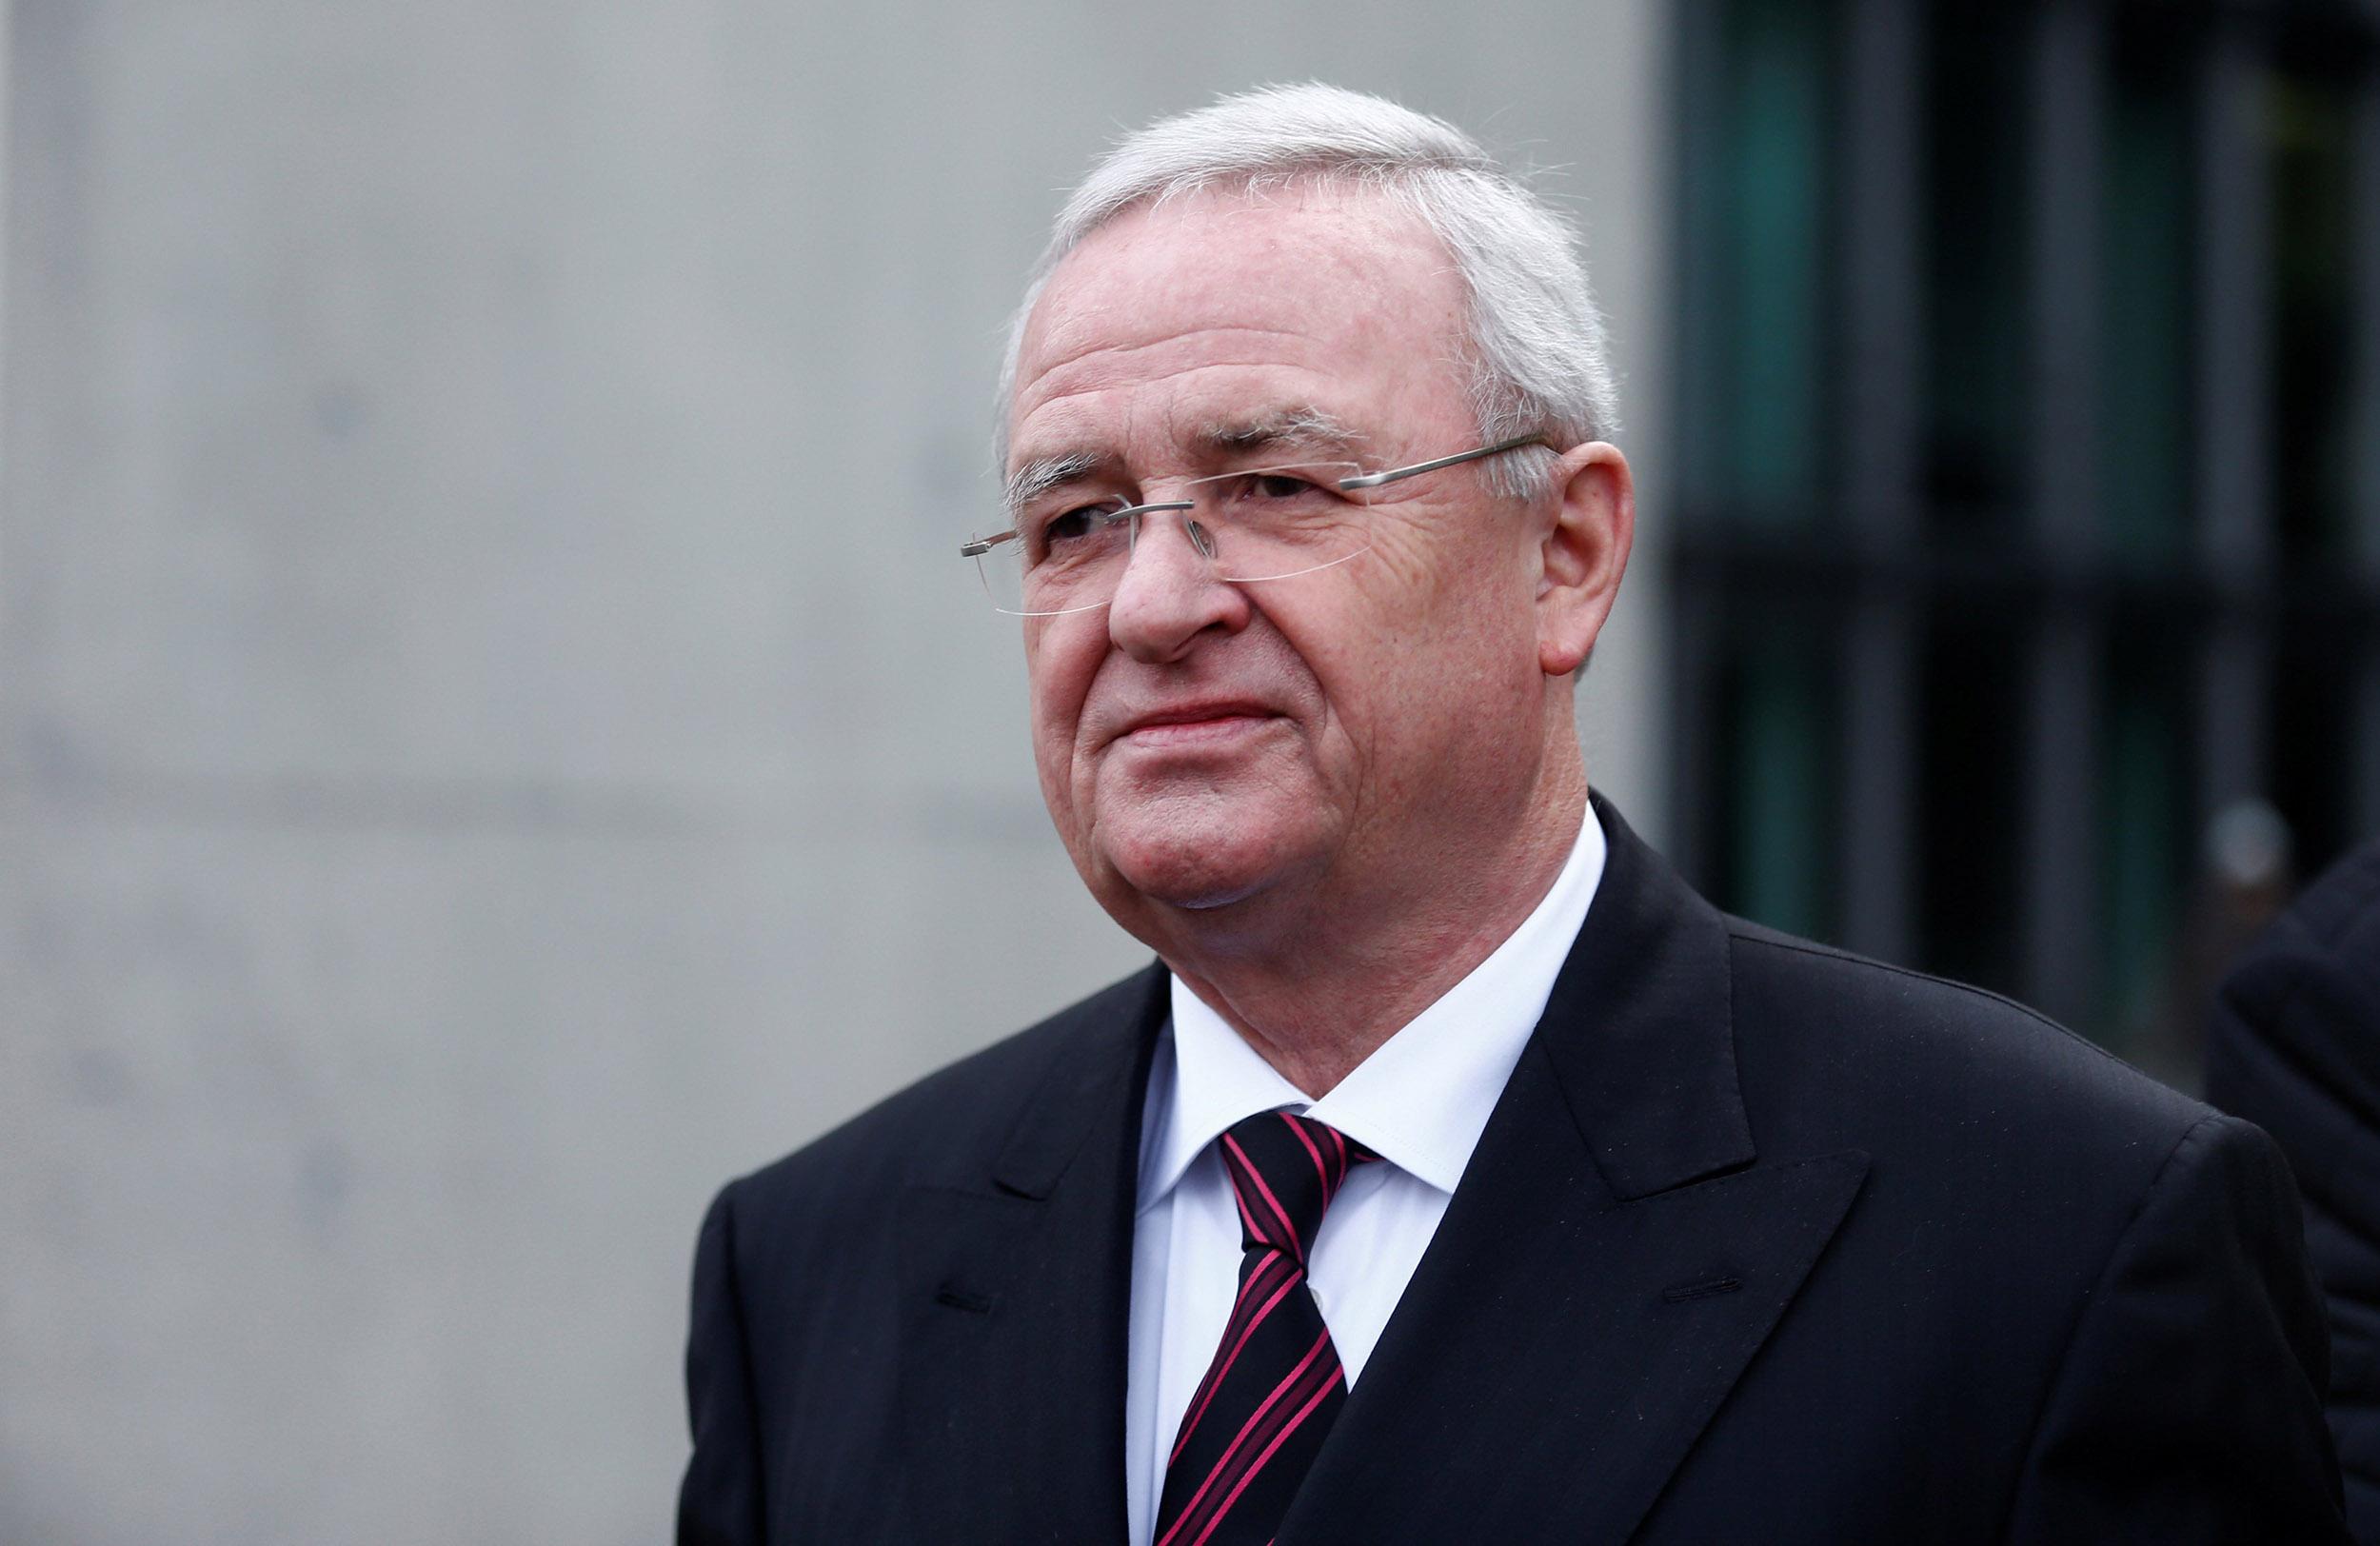 SEC-sues-Volkswagen,-ex-CEO-over-alleged-emissions-fraud-on-investors